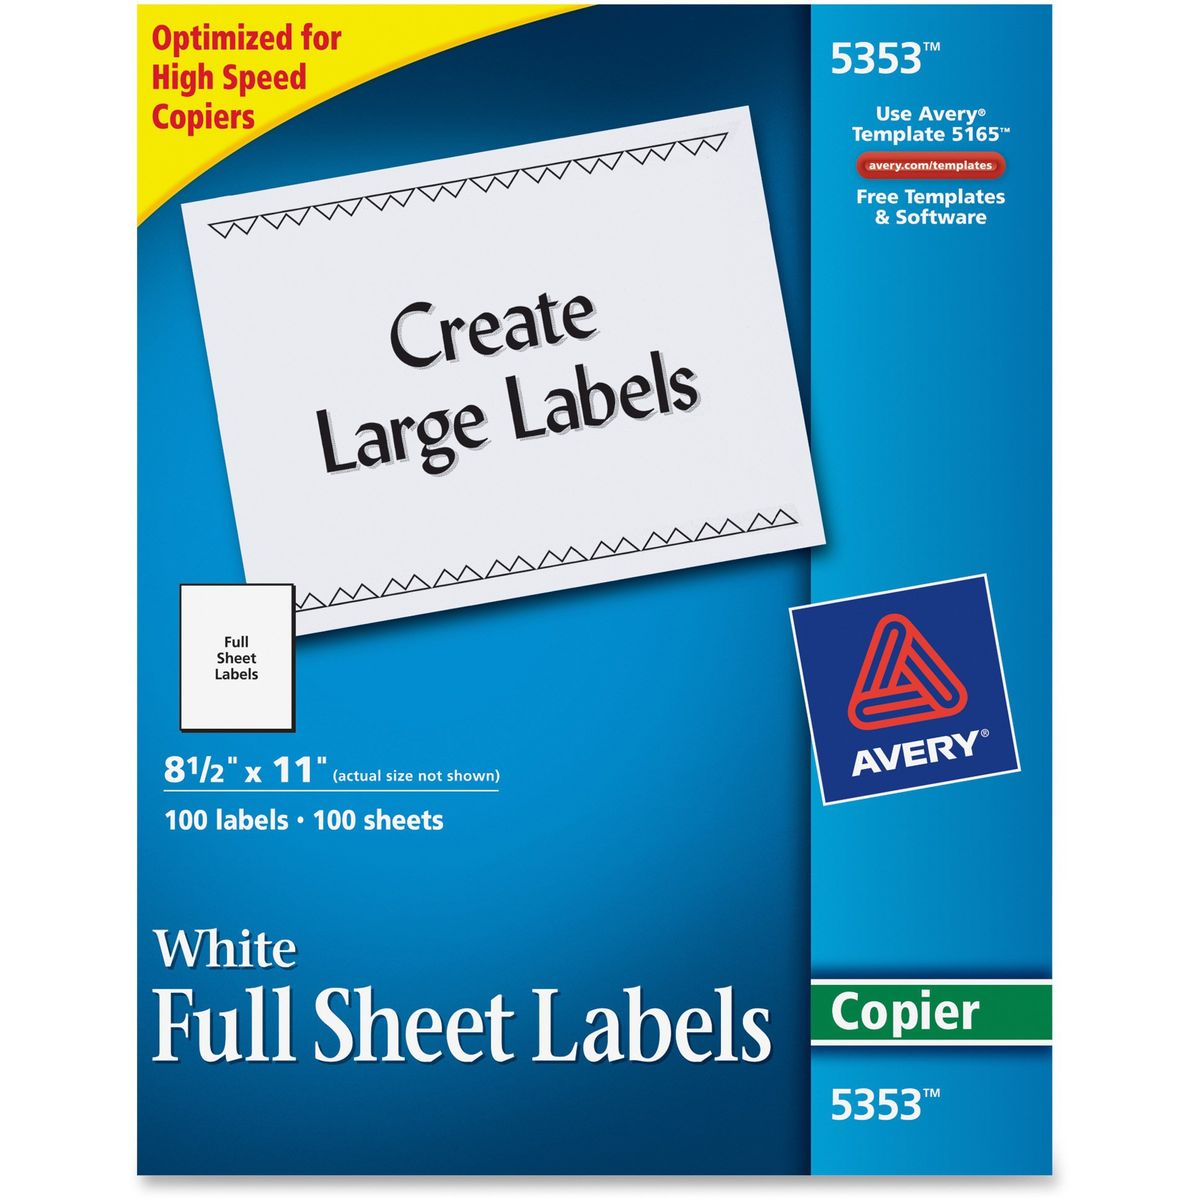 Mailing Labels for Copiers - Walmart.com